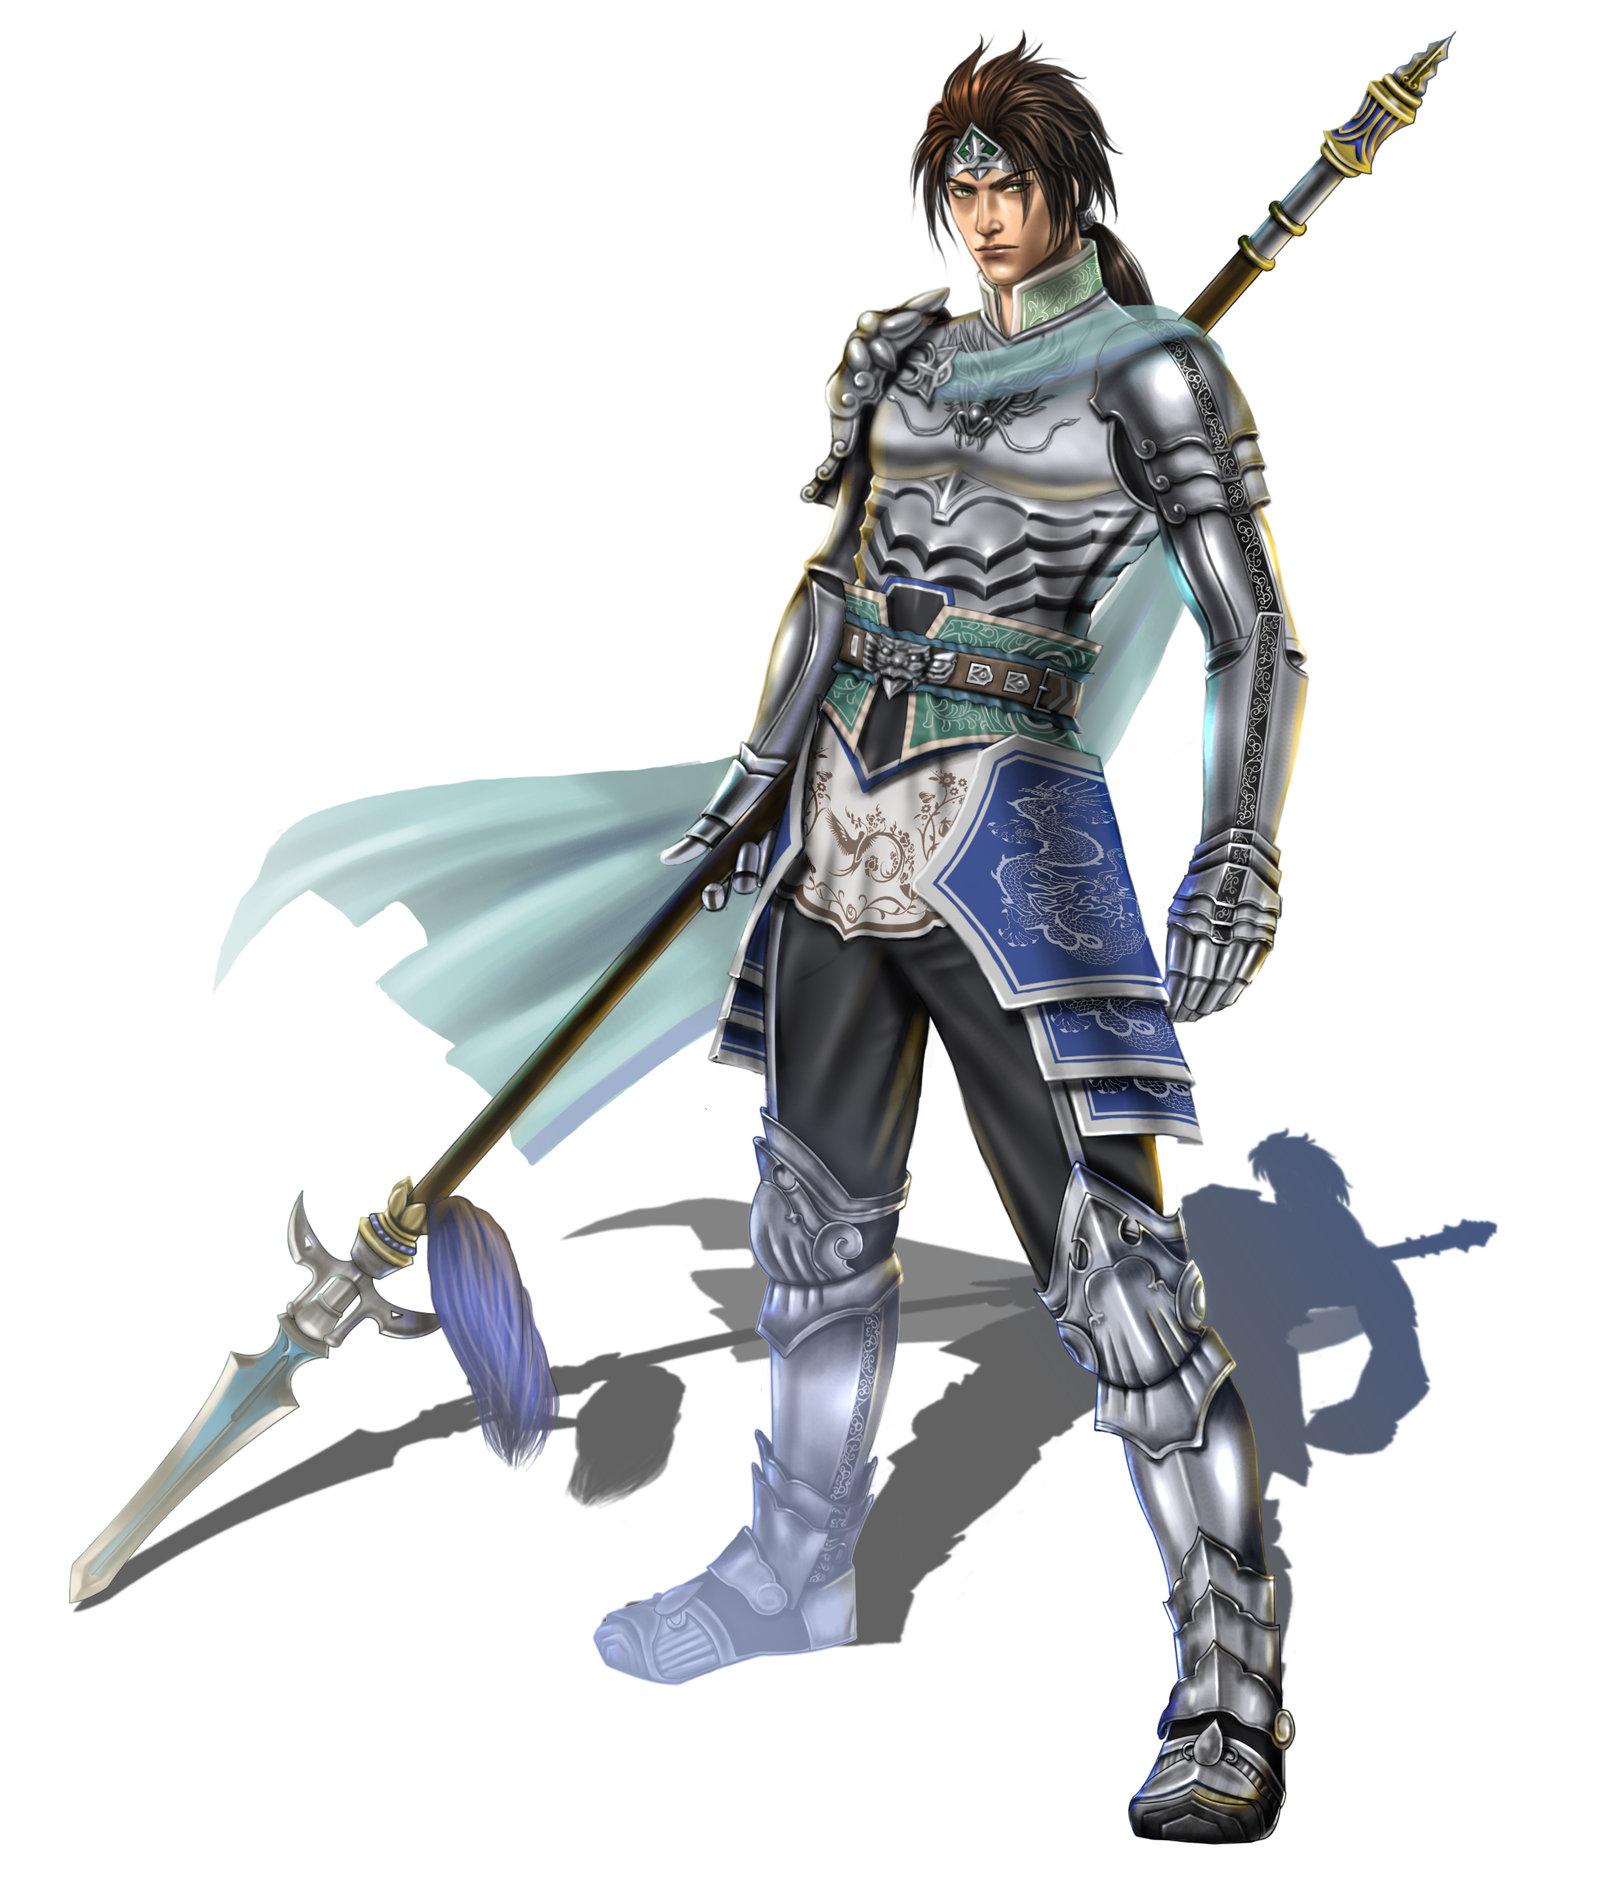 Zhao Yun - Dynasty Warriors - Image #948545 - Zerochan Anime Image Board